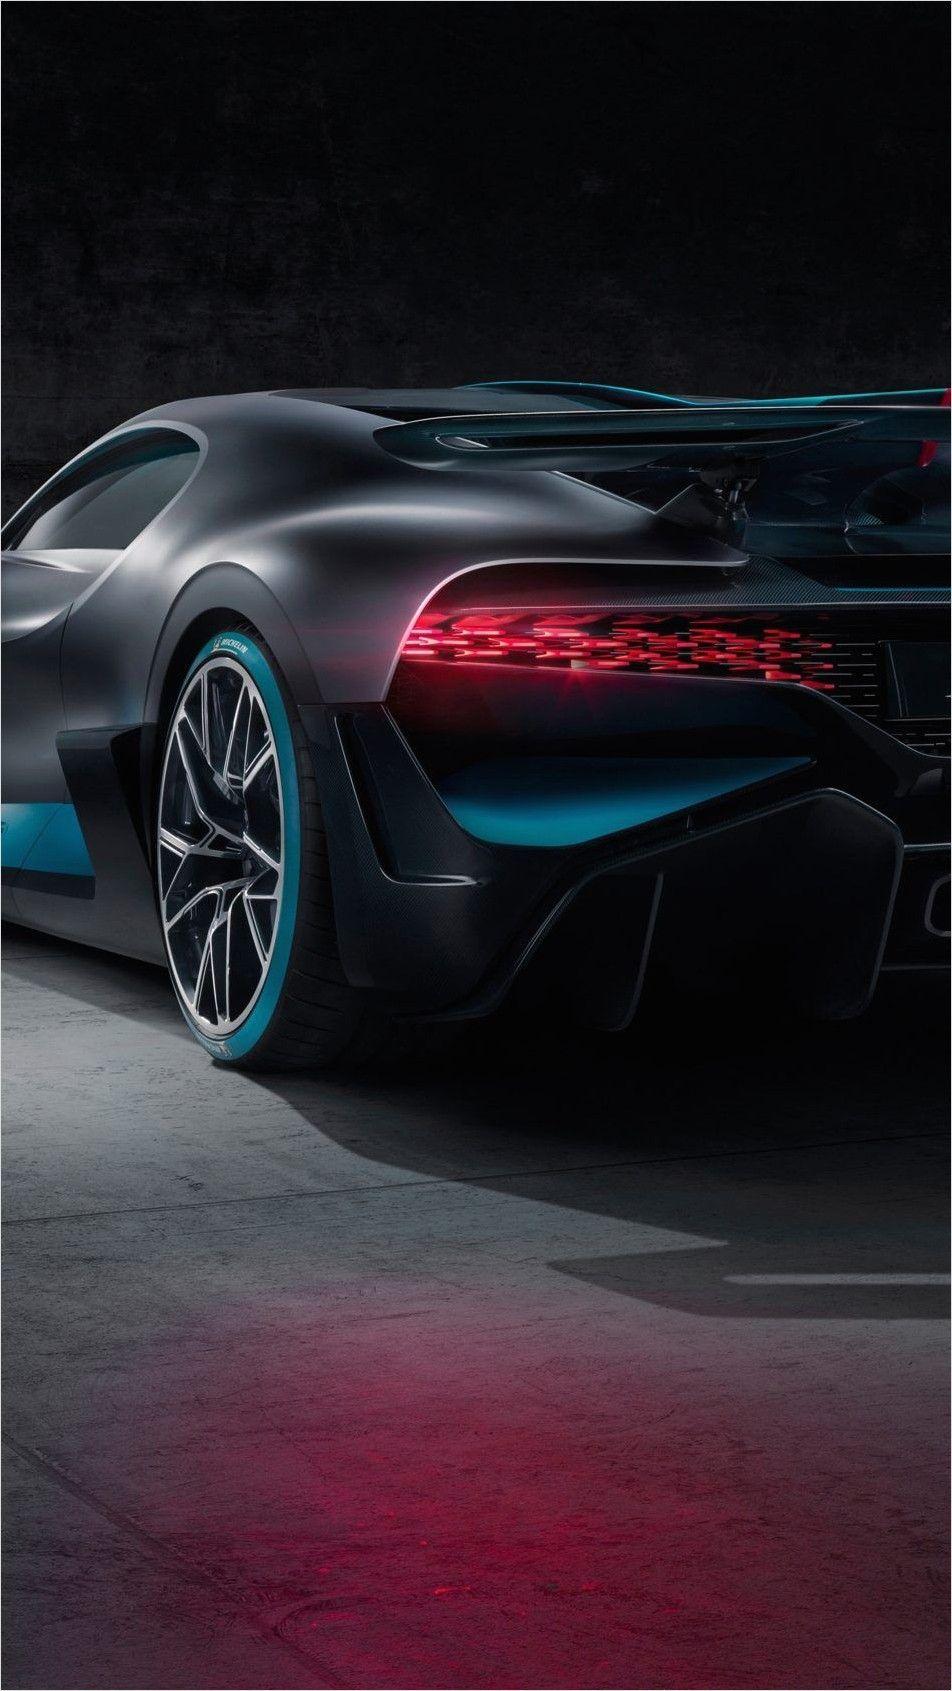 Neon car wallpapers free by zedge. Super Car Wallpaper 4k